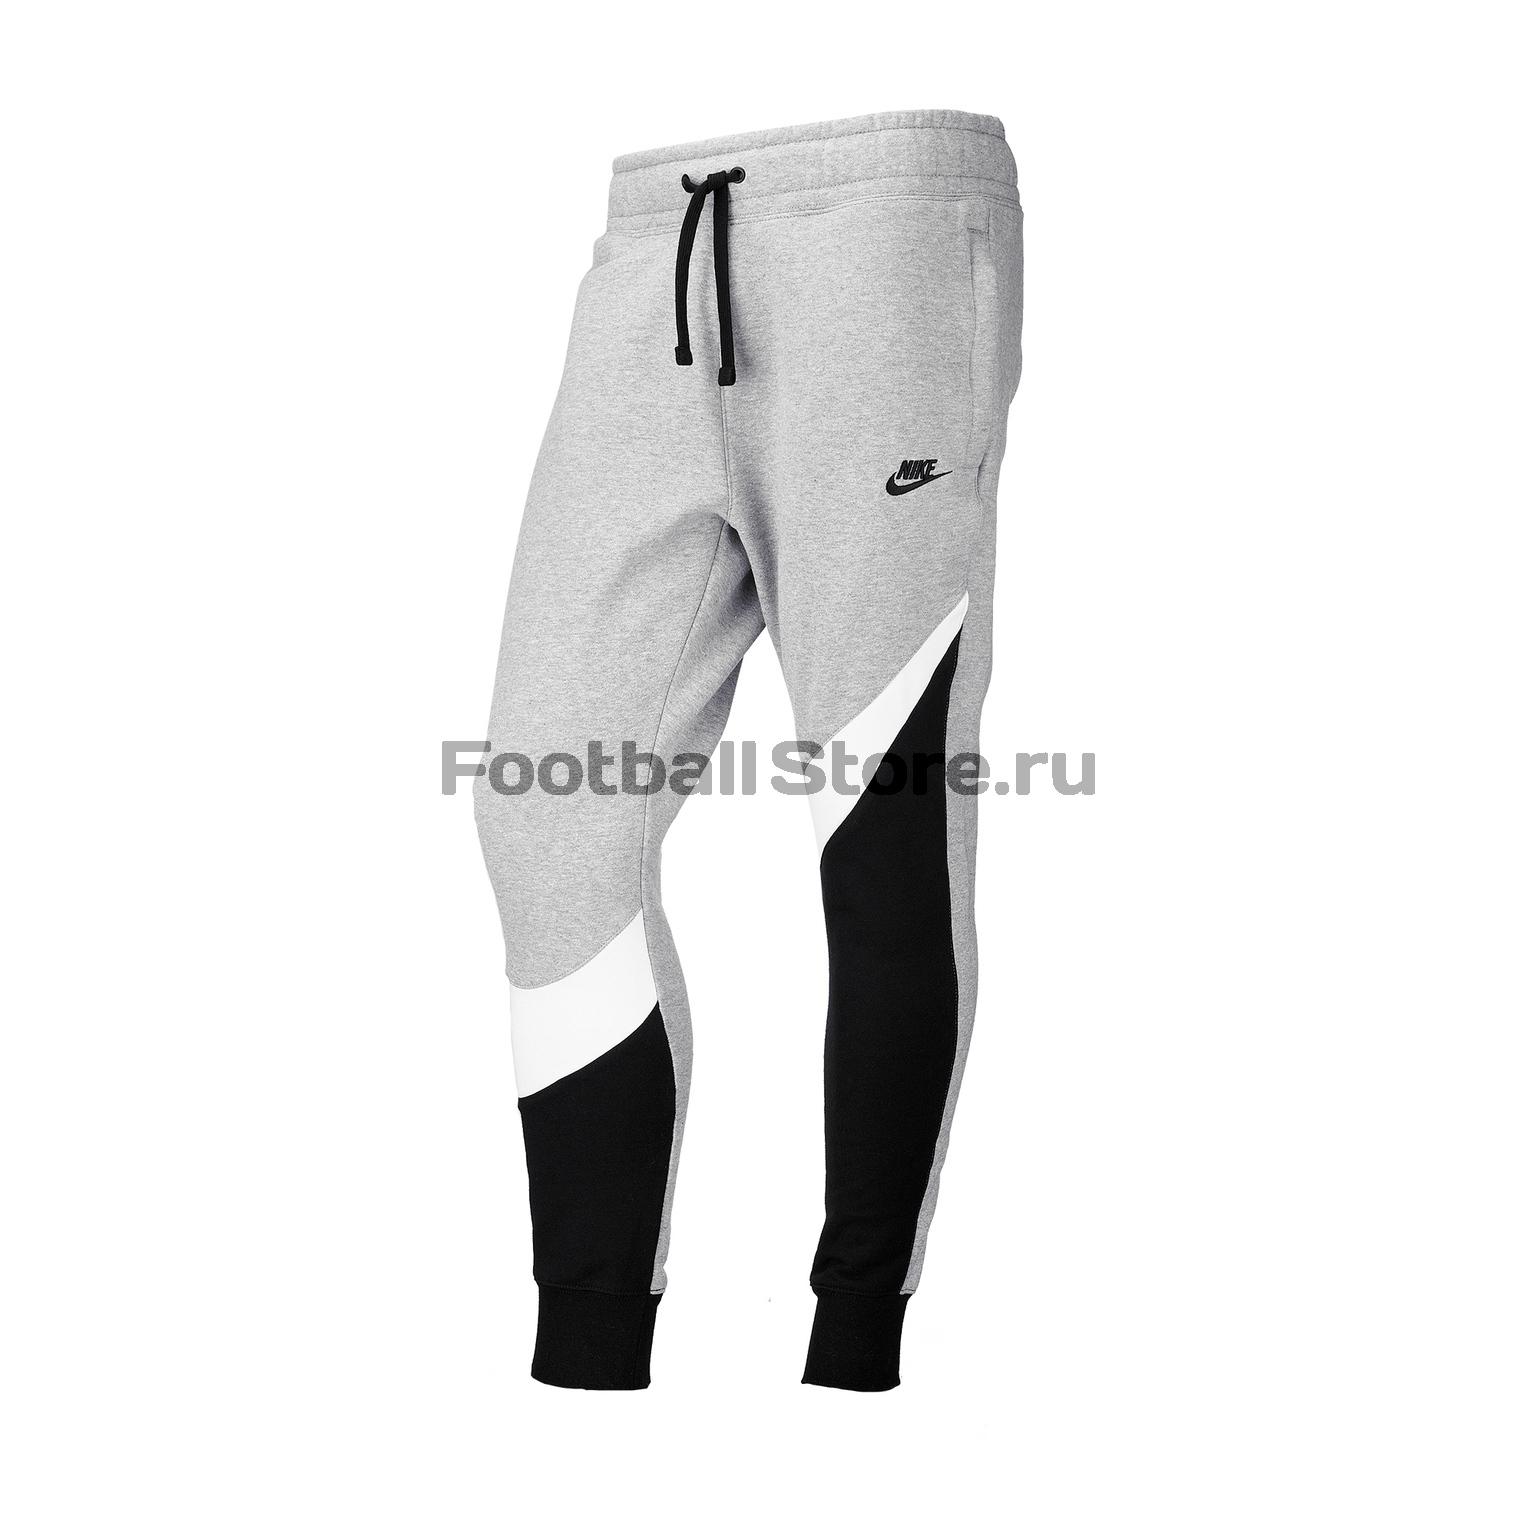 Брюки Nike Pant BB BQ6467-063 брюки nike pant bb bq6467 451